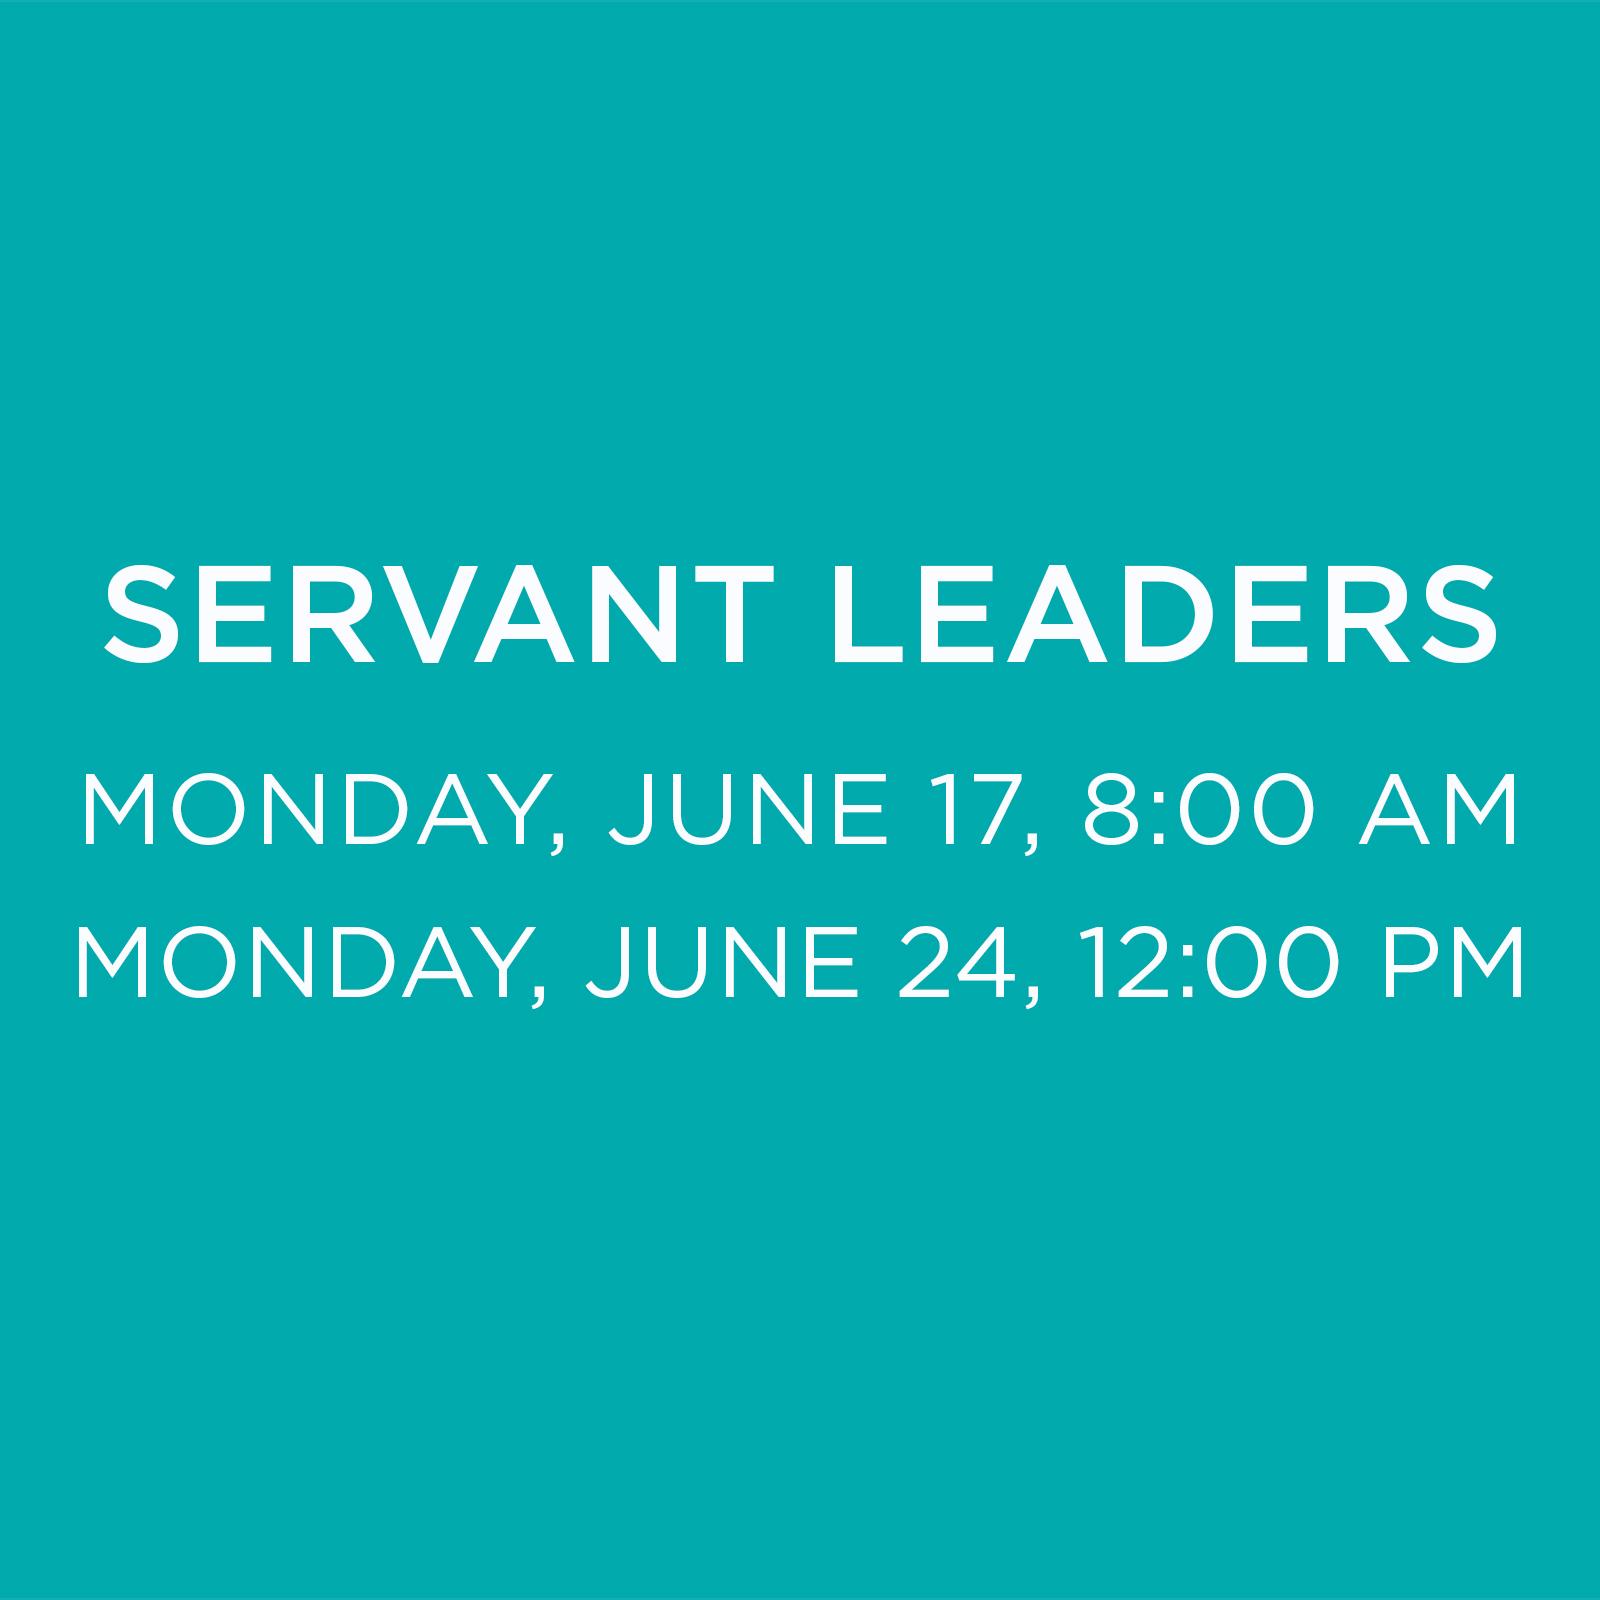 SERVANT LEADER DEPARTURE Times.jpg